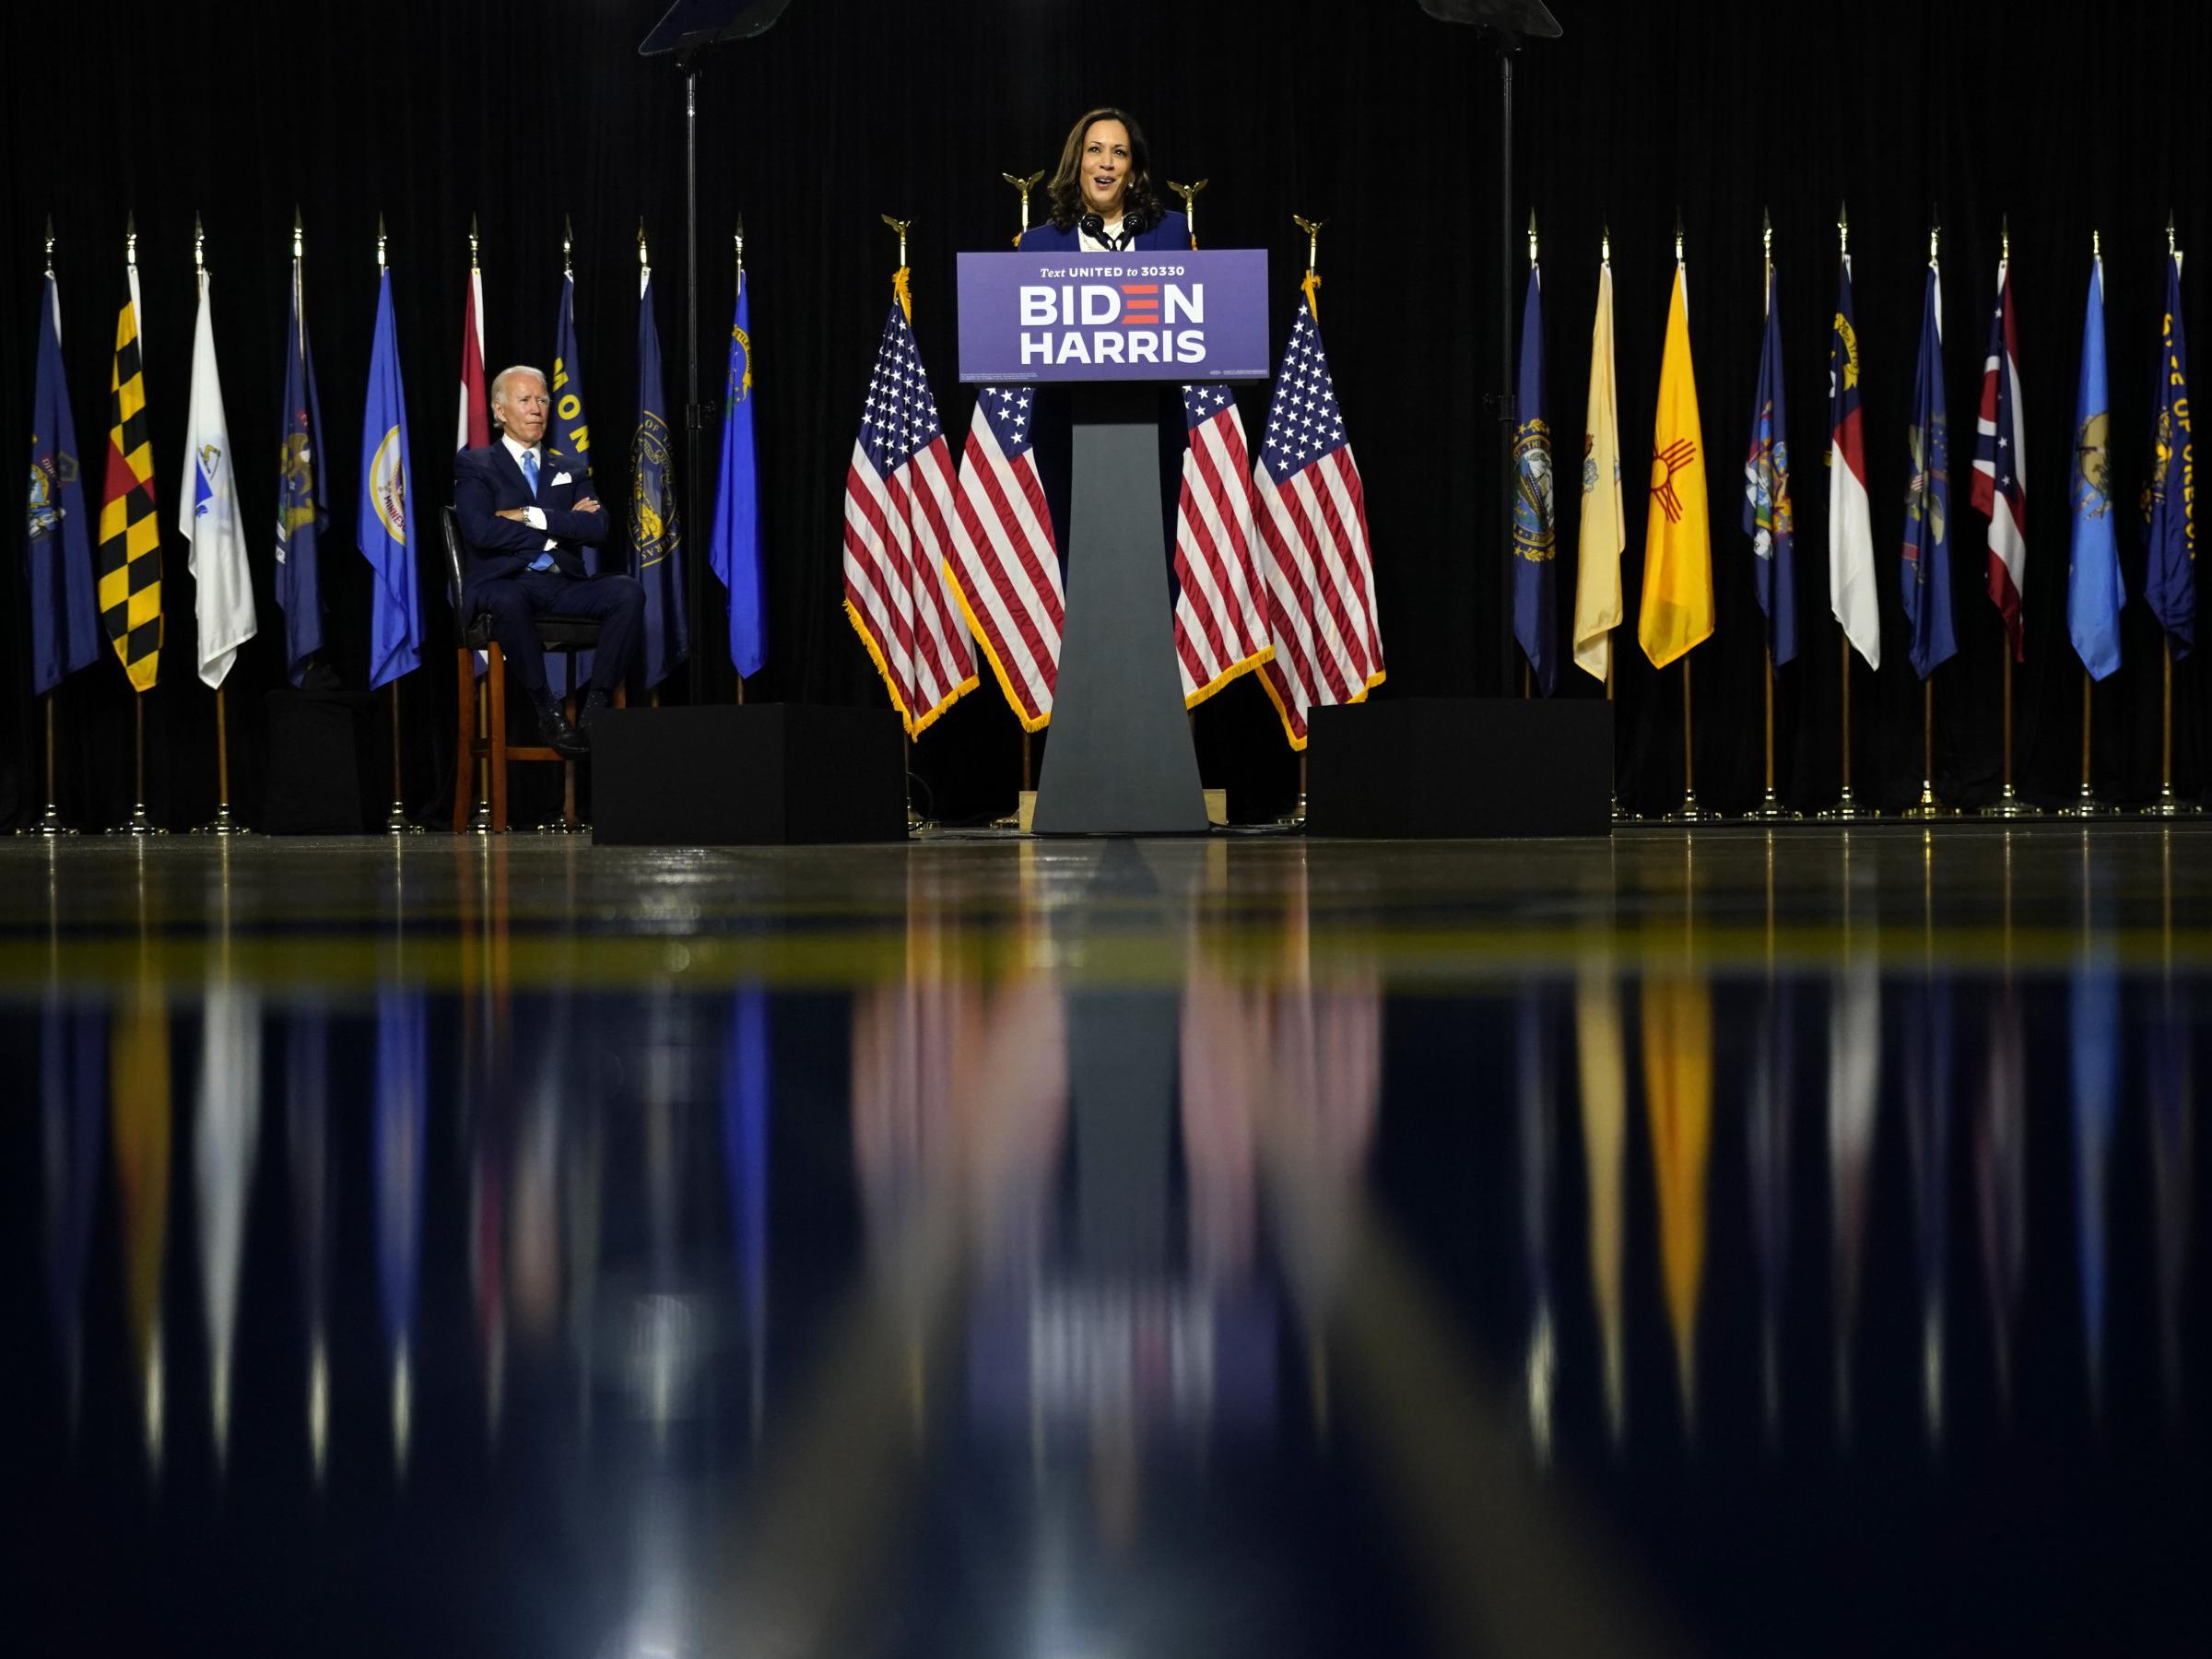 Billie Eilish and John Legend Set to Perform at Democratic Convention